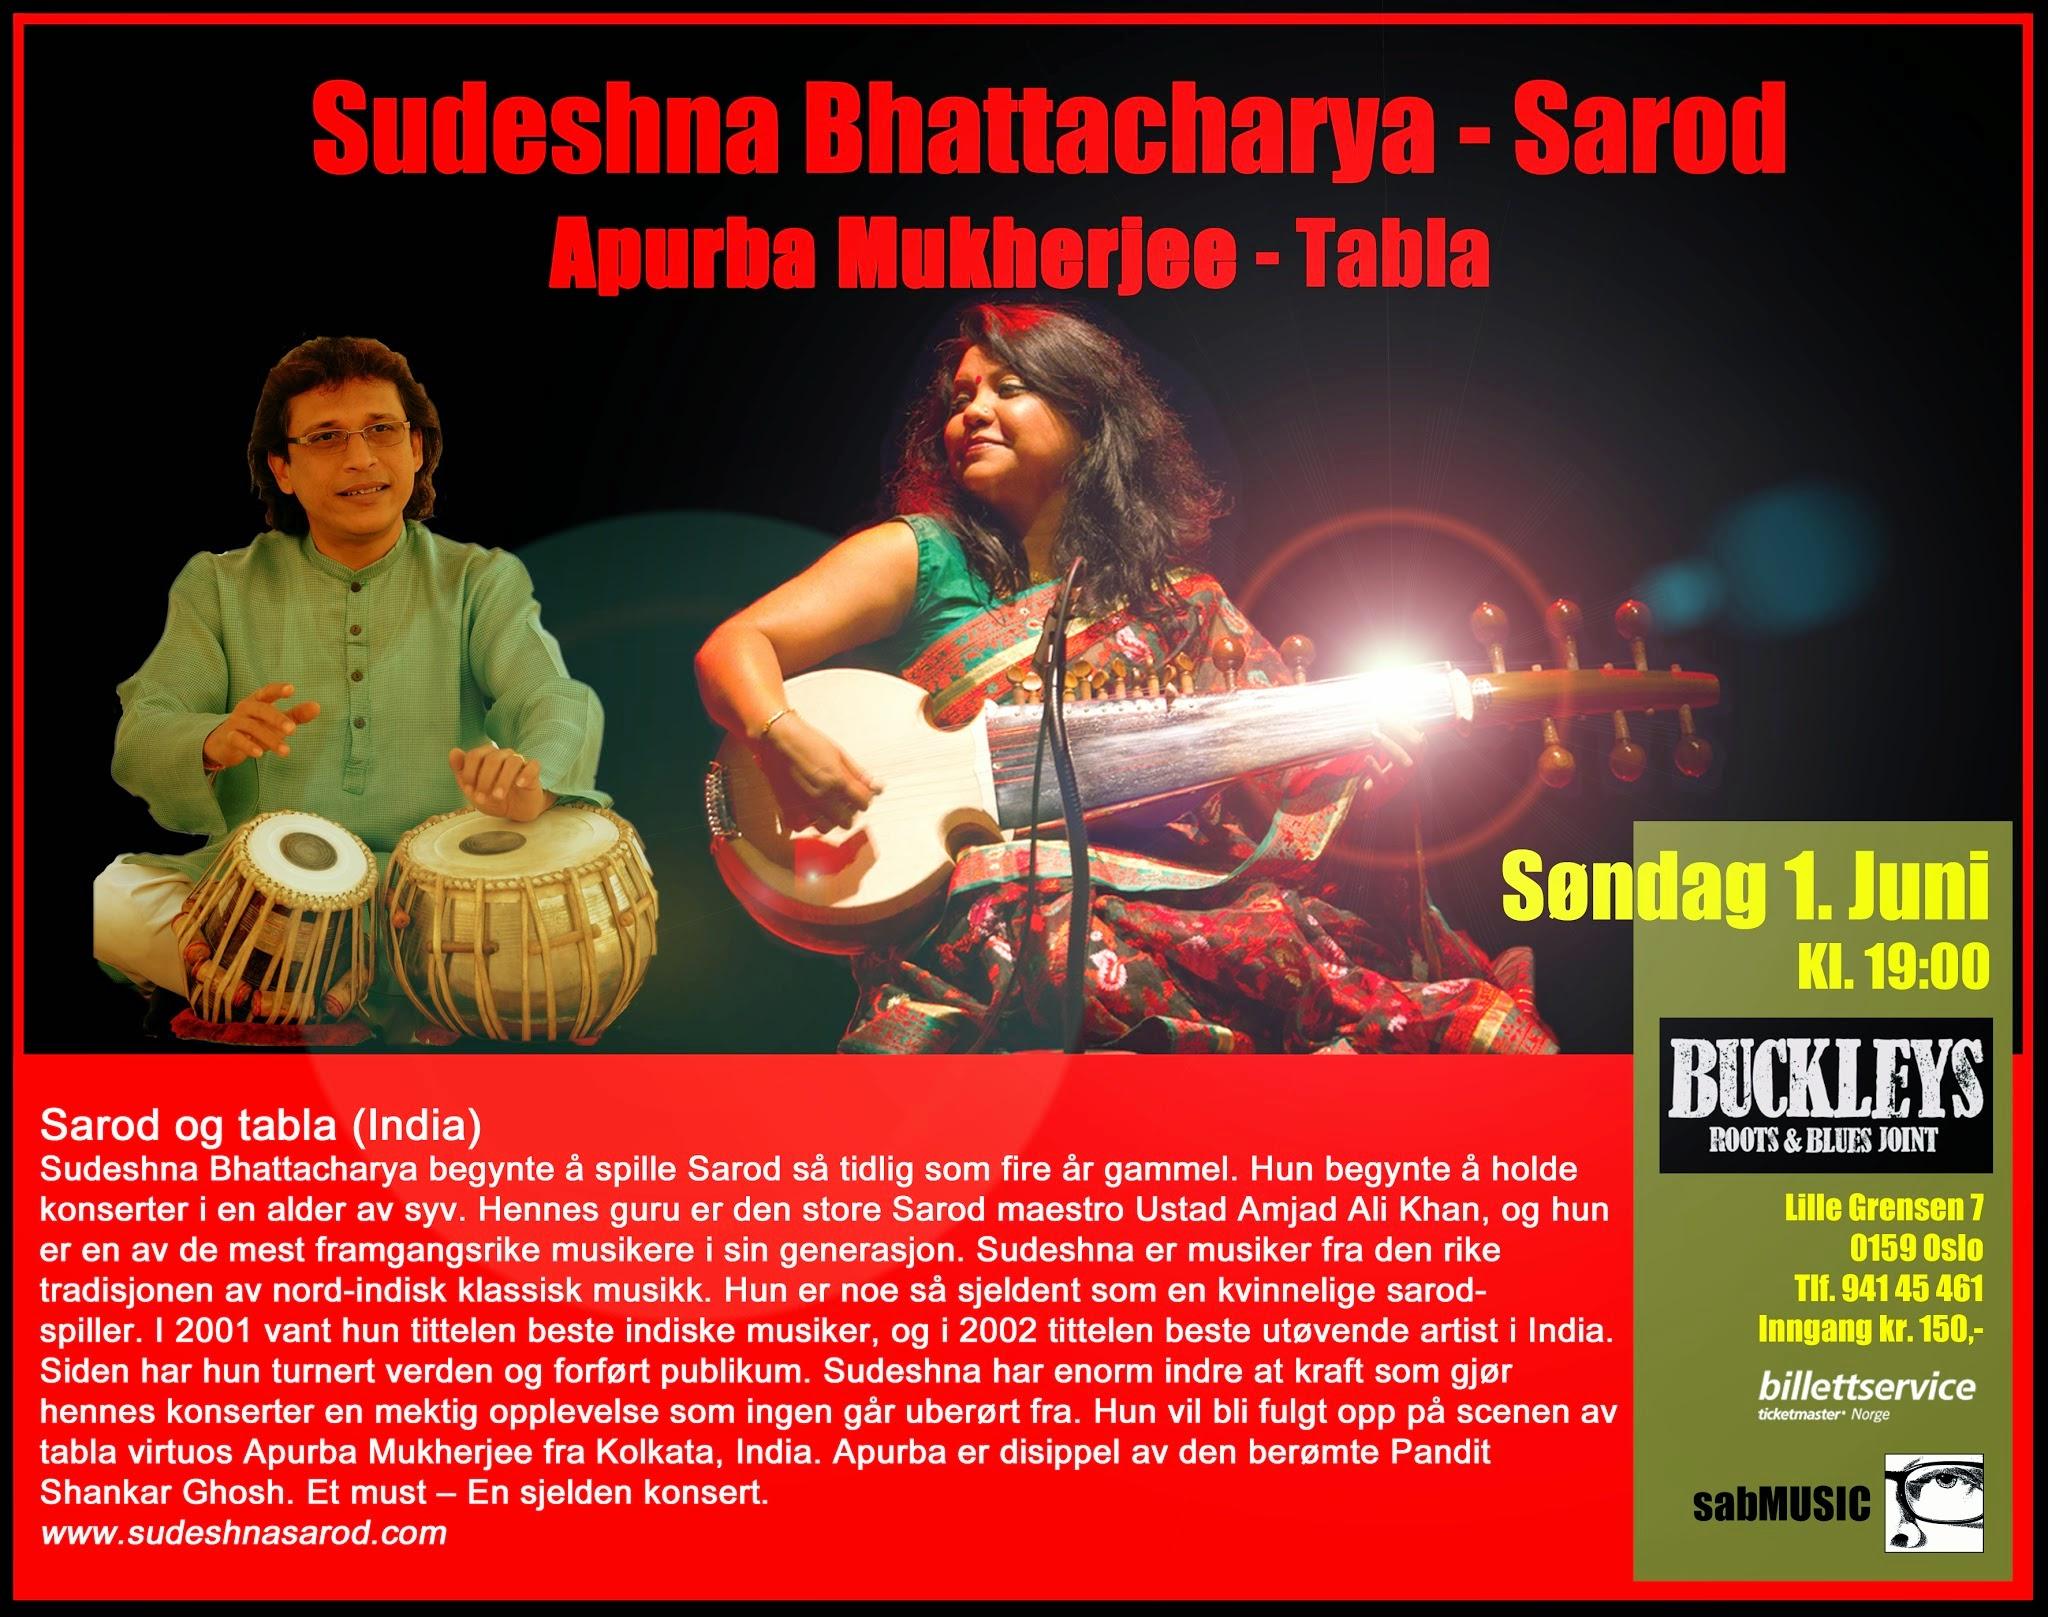 Photo: Sudeshna Bhattacharya - Sarod - Buckleys, Oslo 1. June 2014 - sabART